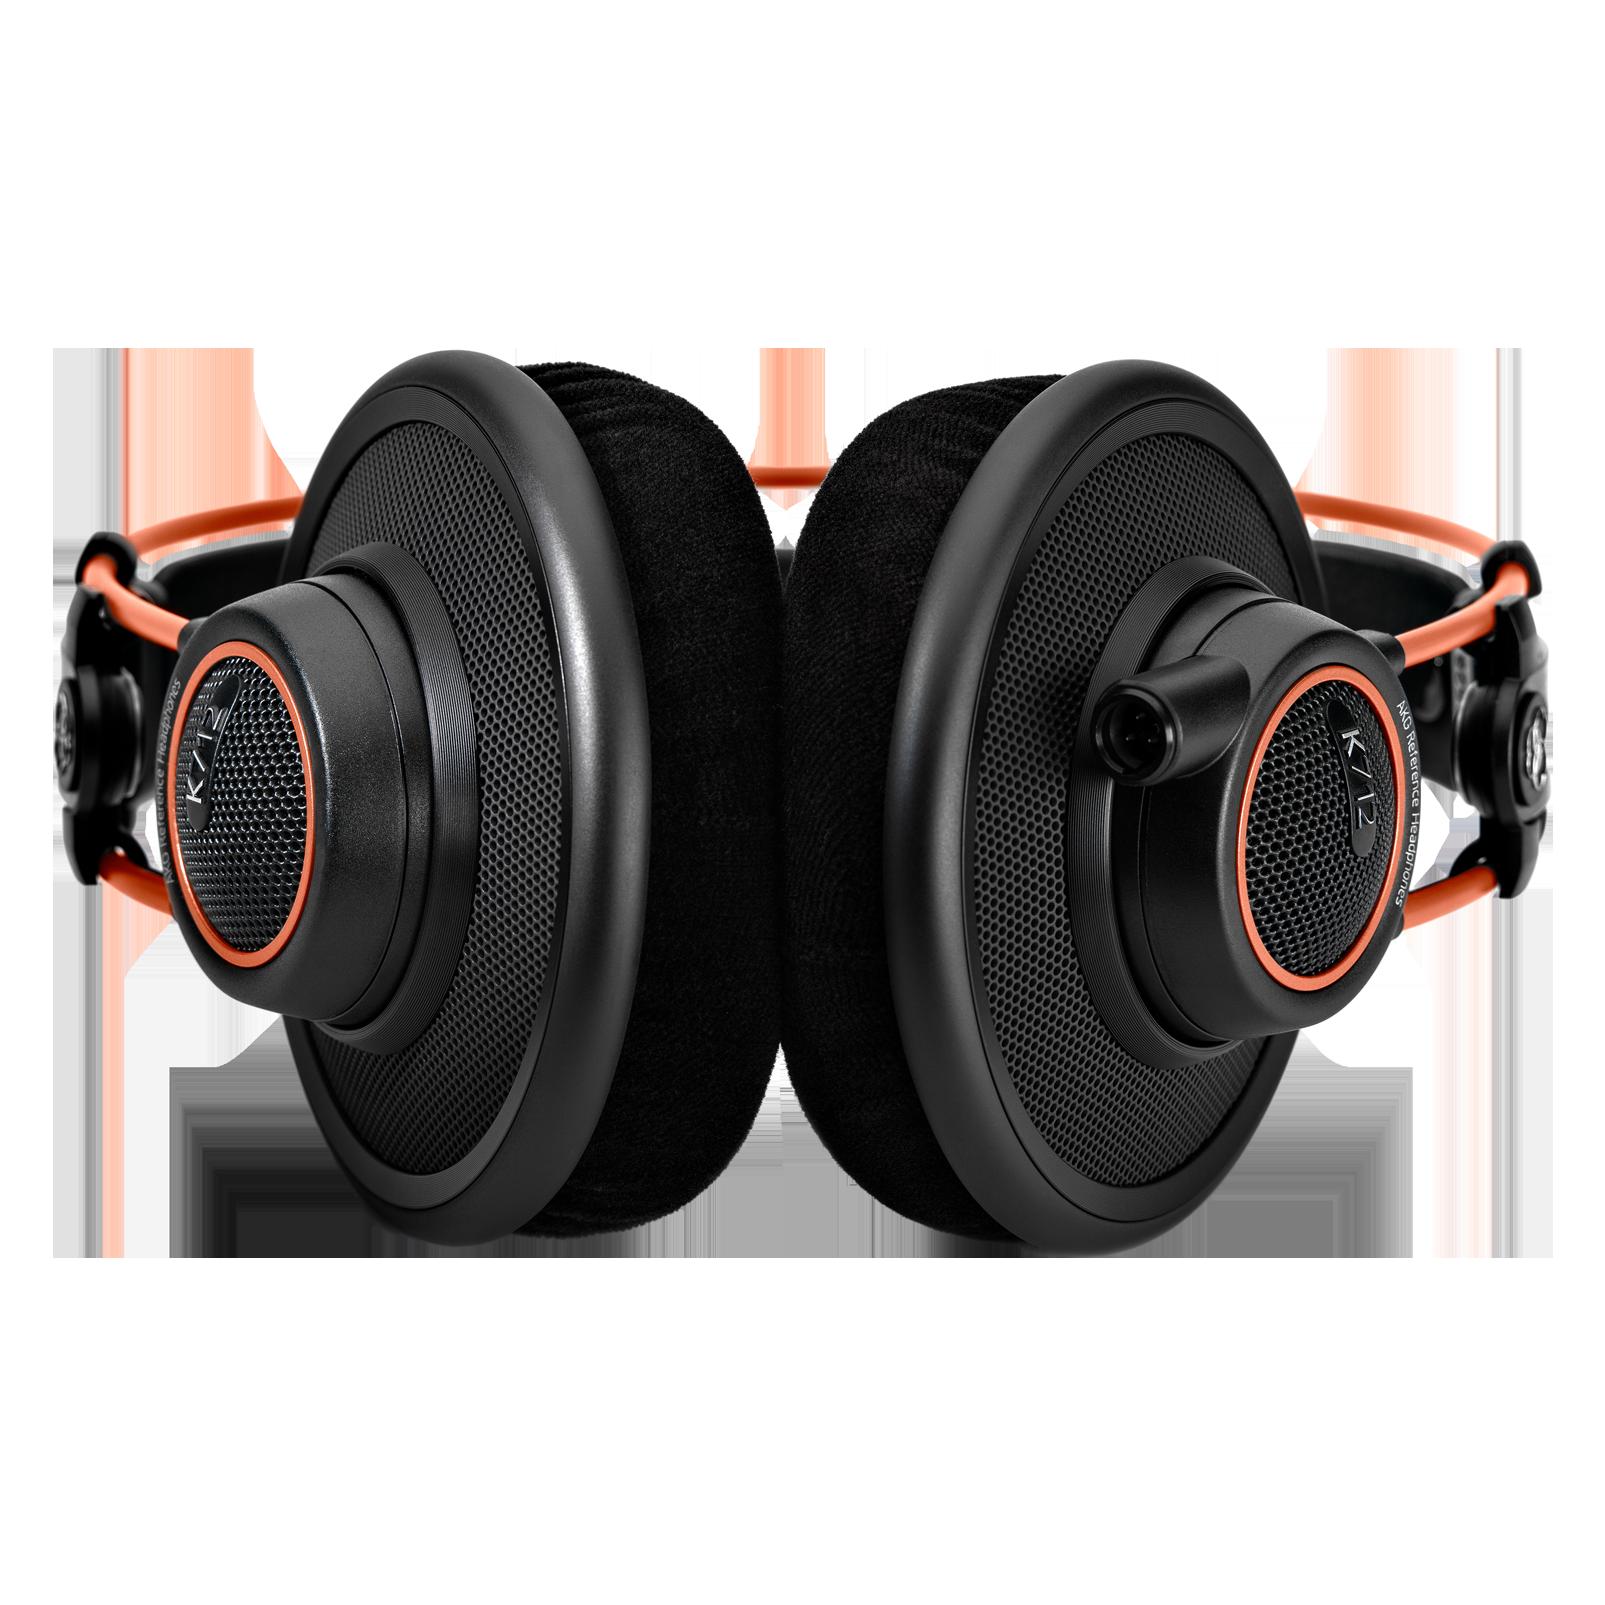 K712 PRO - Black - Reference studio headphones  - Detailshot 1